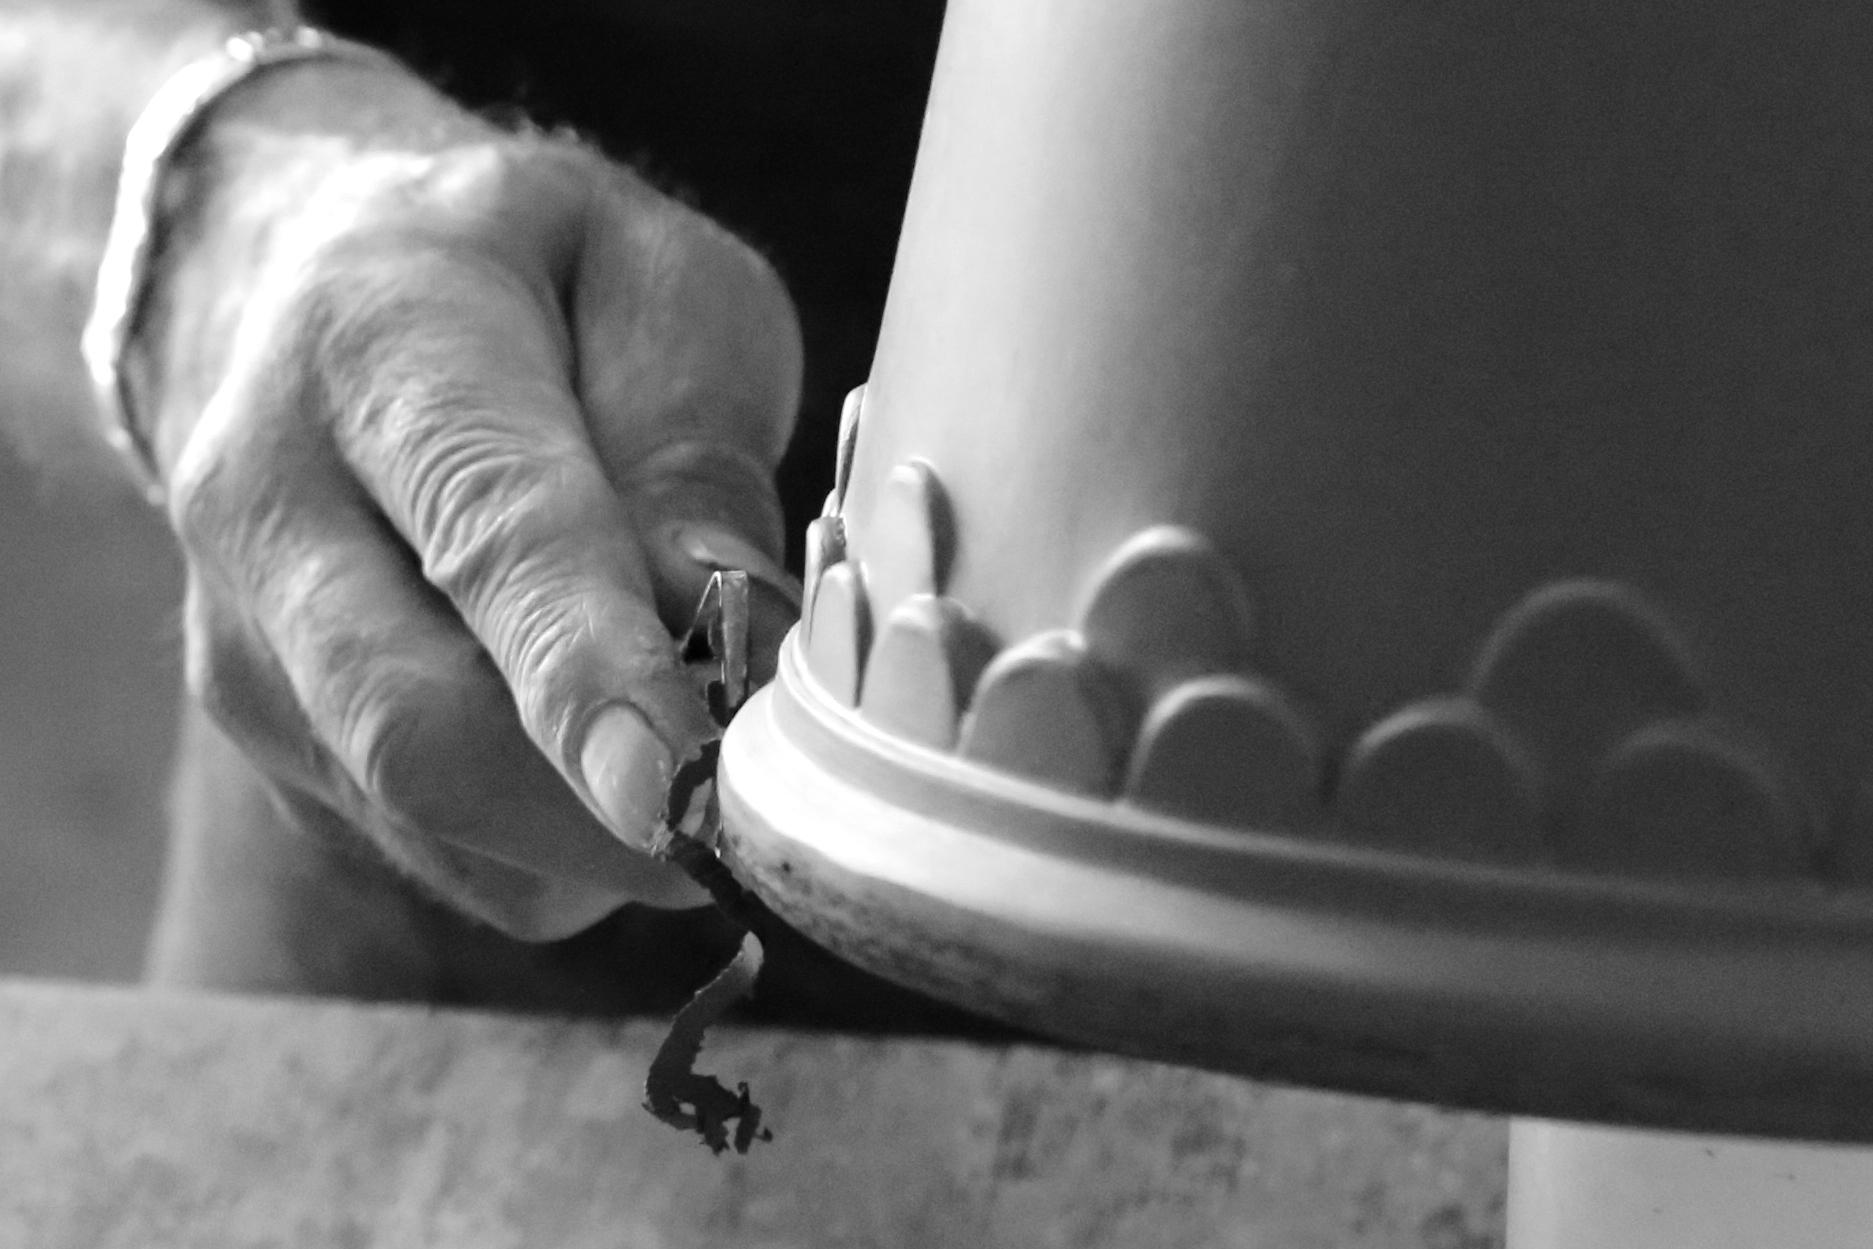 Köpenhamn kruka (grå 14 cm) - Bergs Potter